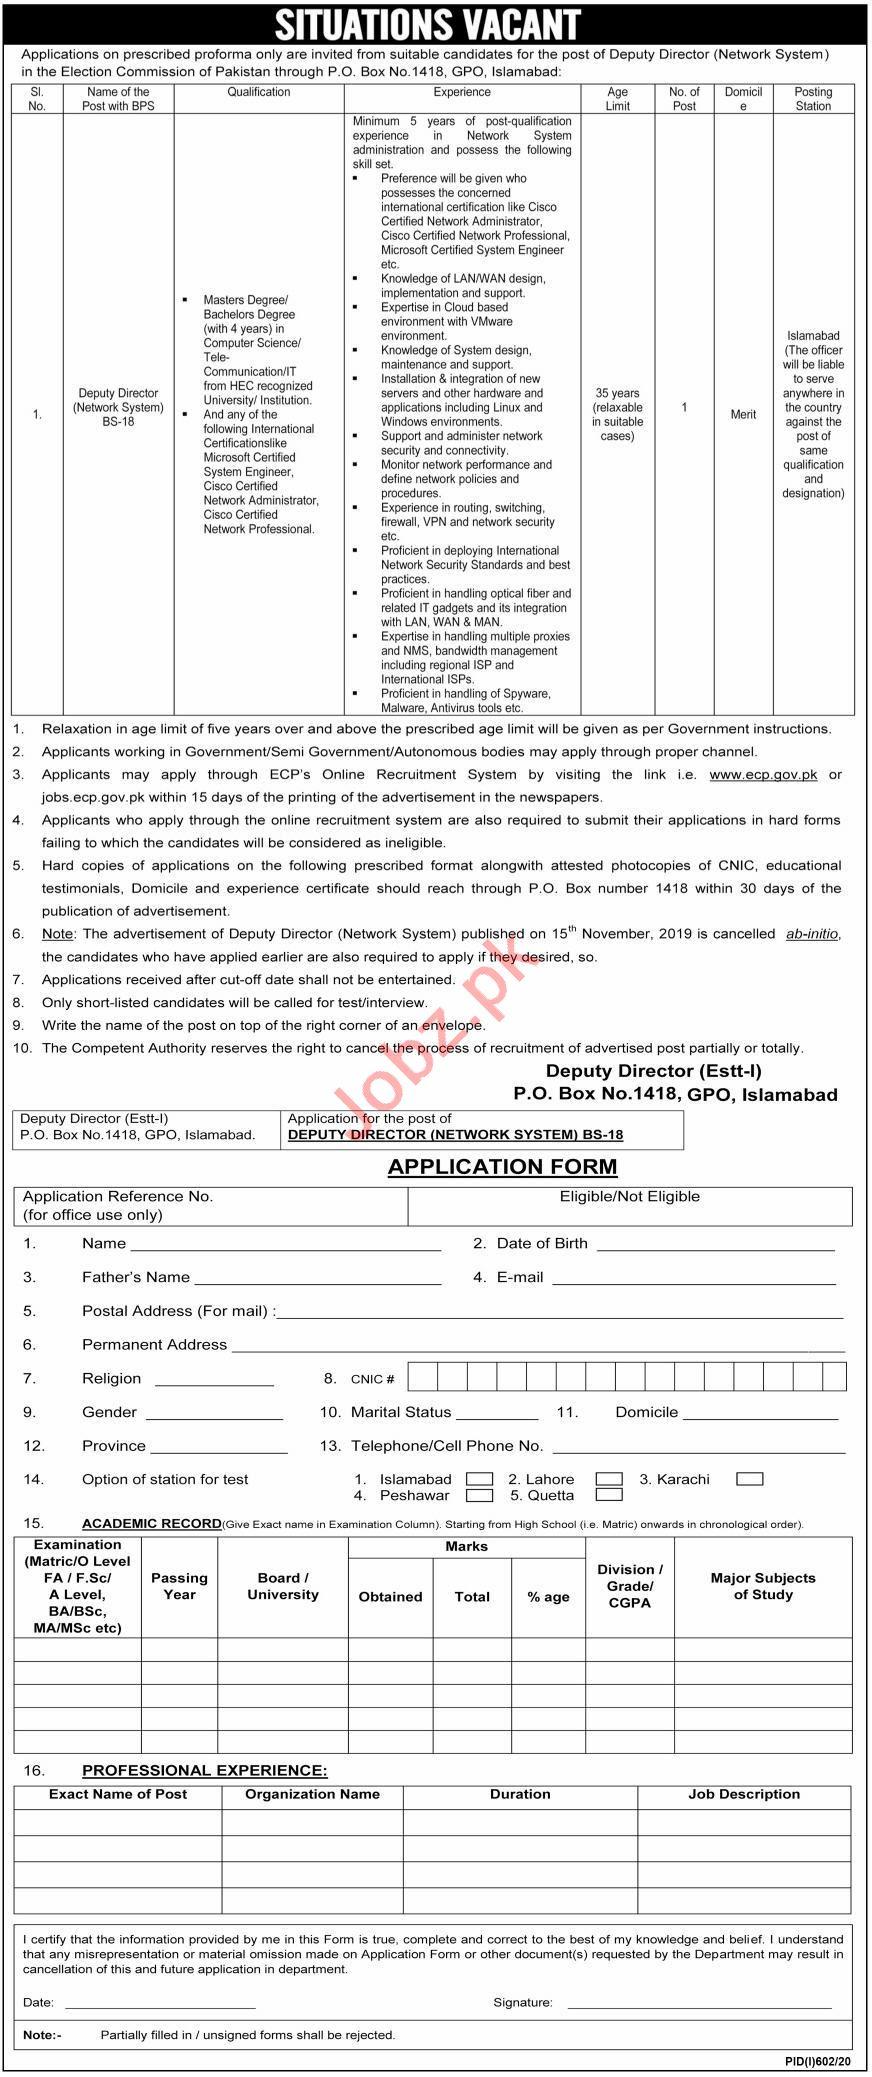 P O Box No 1418 GPO Islamabad Jobs 2020 for Deputy Director